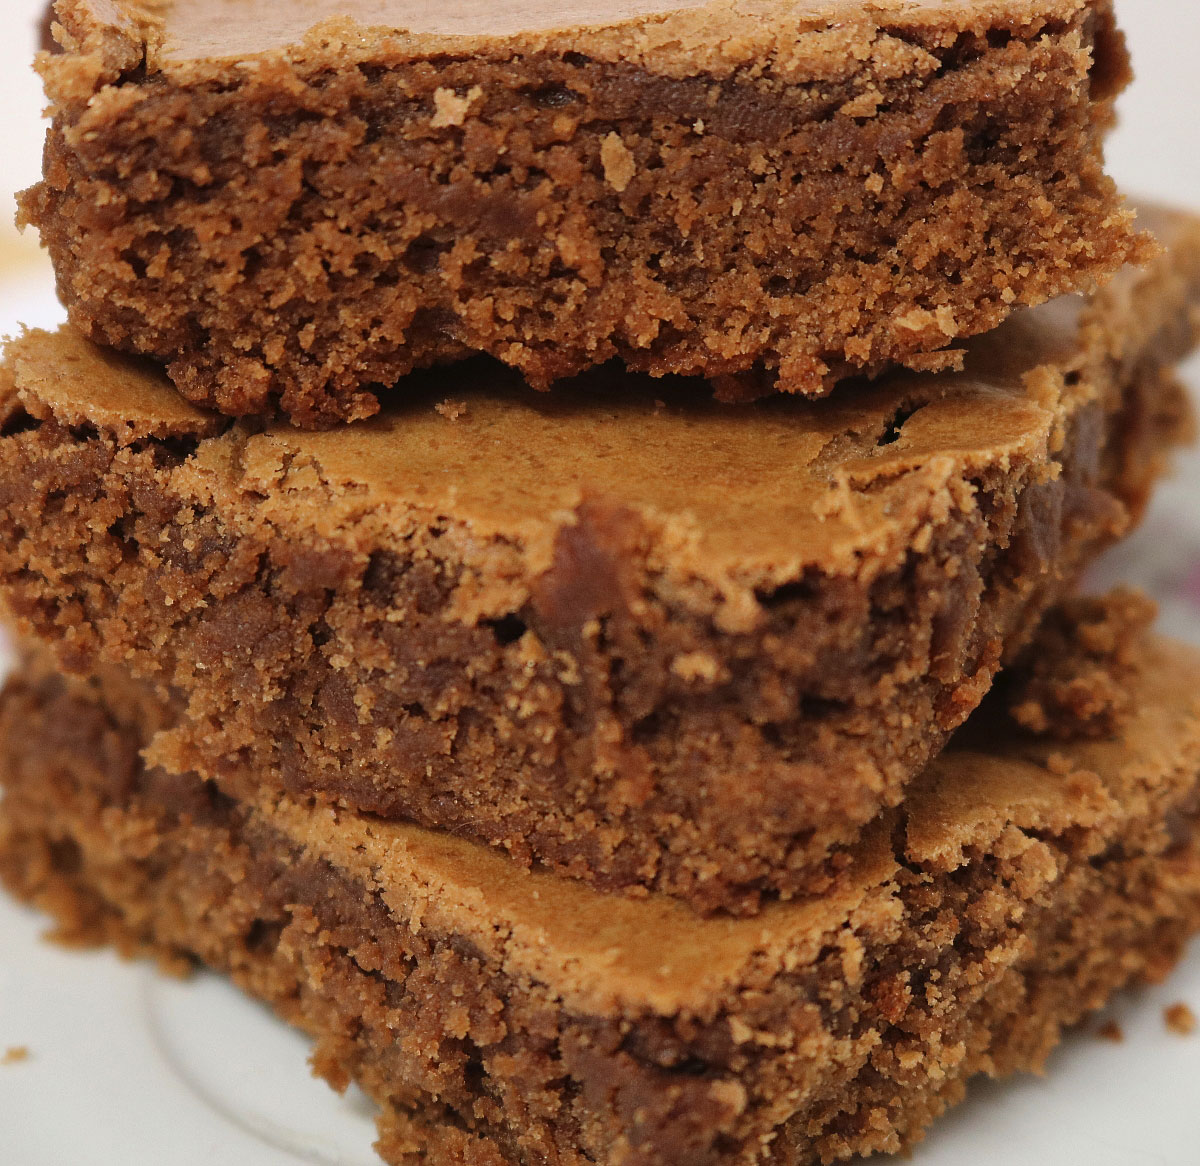 chocolatebutterbrowniesstack3.jpg